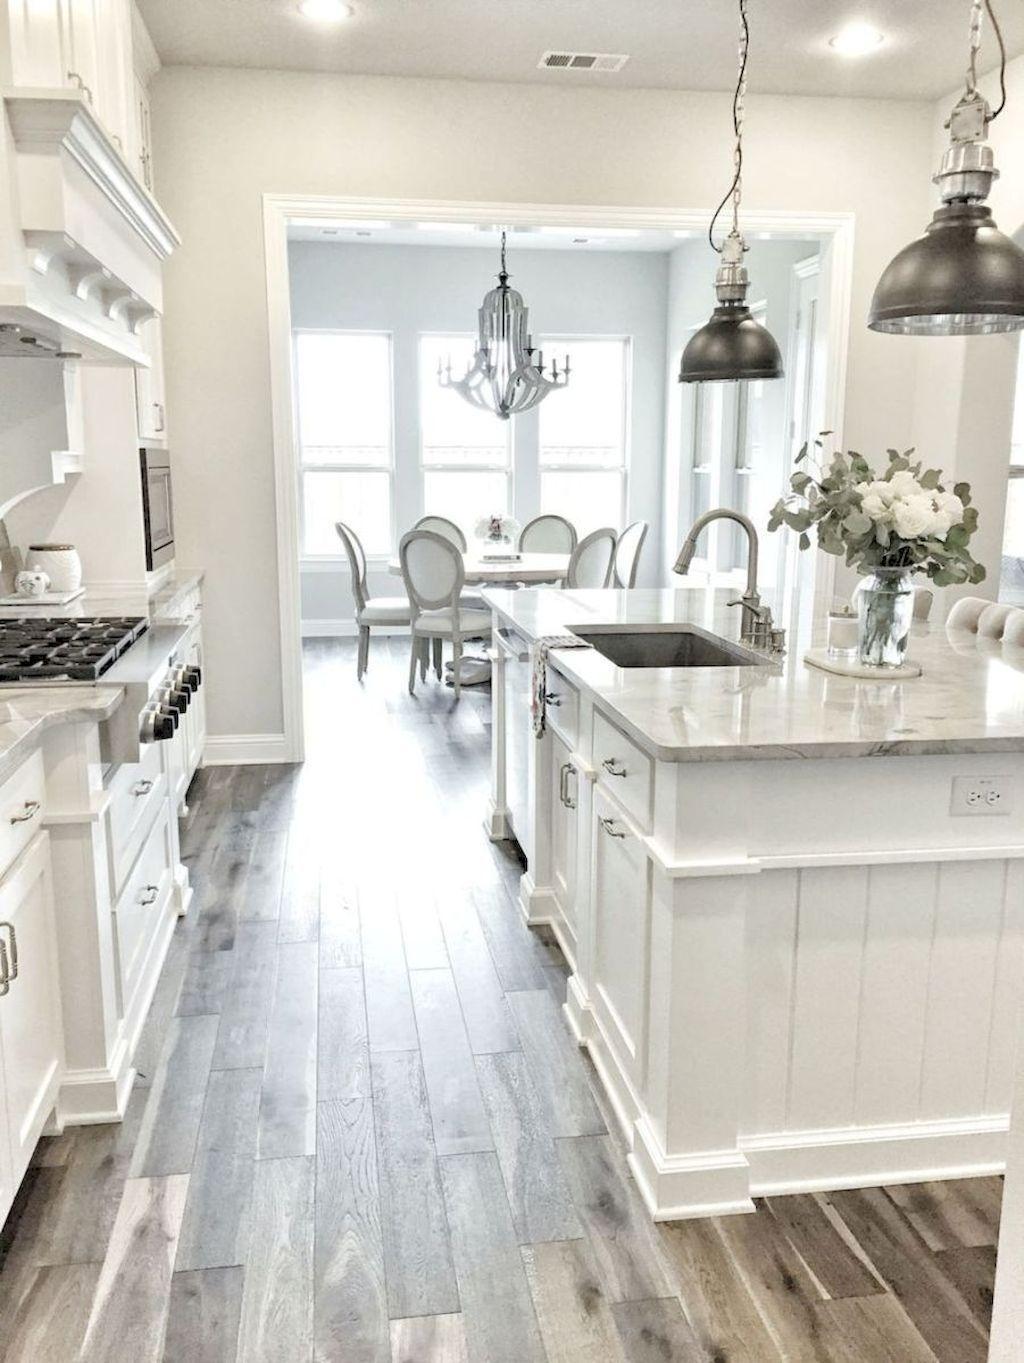 Tariq yousuf also best kitchens images deco cuisine diy ideas for home decor rh pinterest